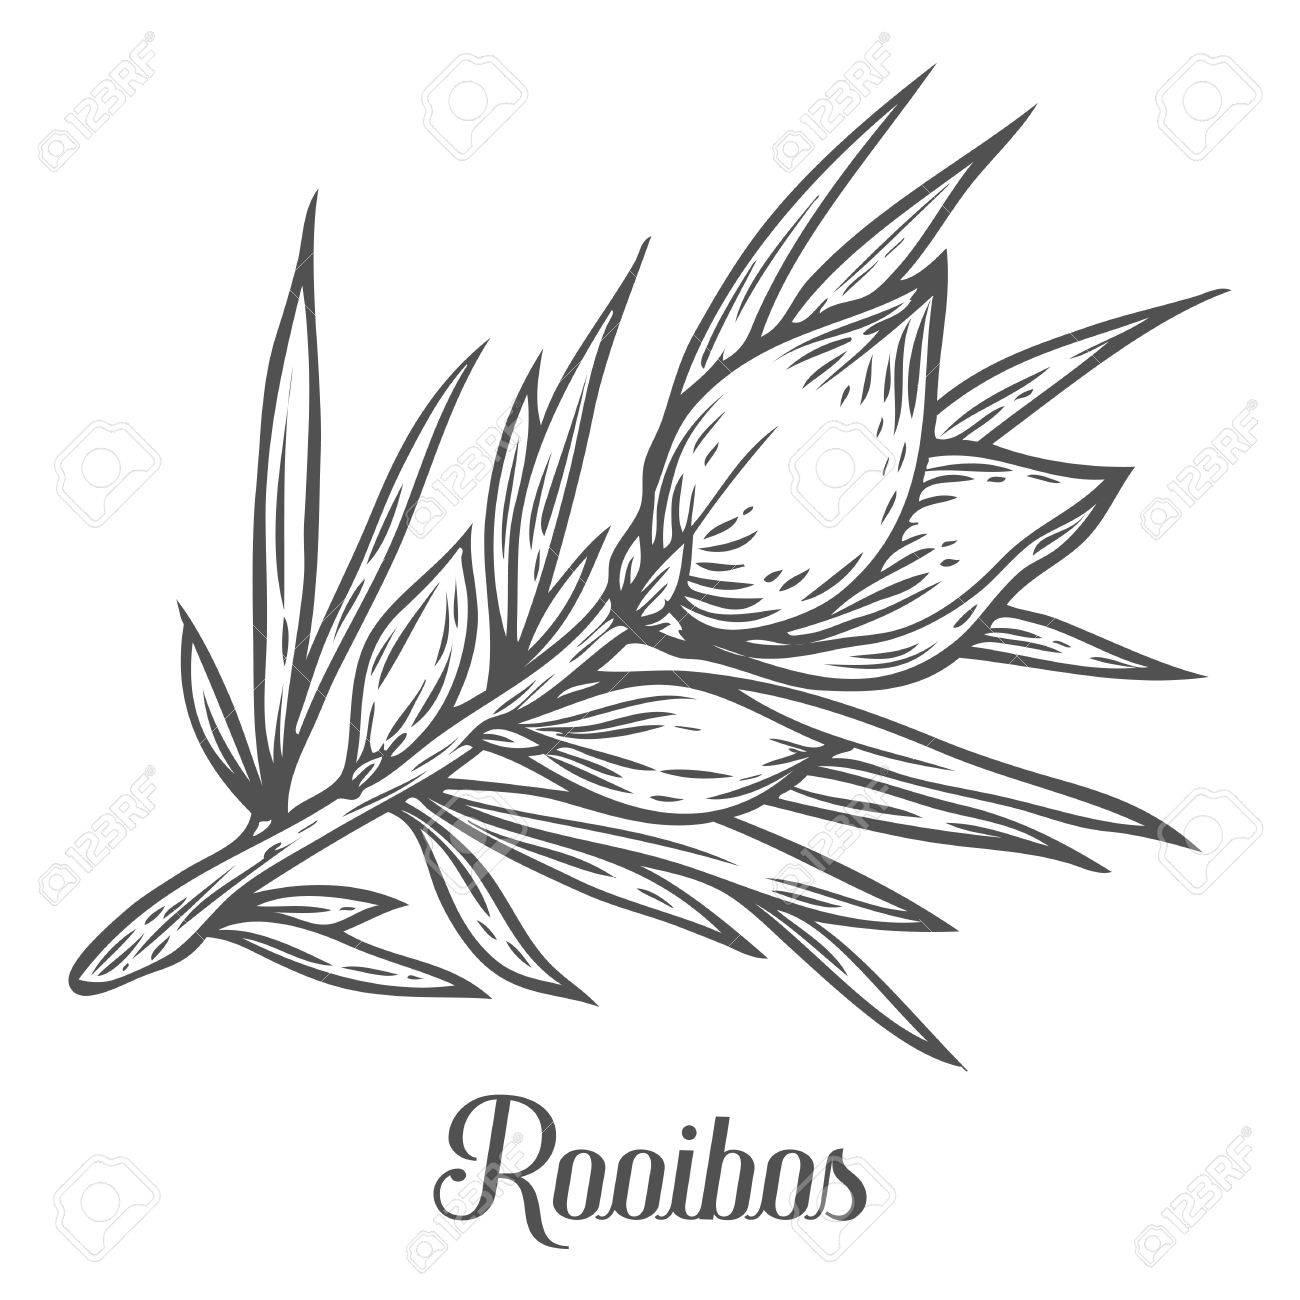 1300x1300 Rooibos Tea Plant Leaf Hand Drawn Sketch Vector Illustration